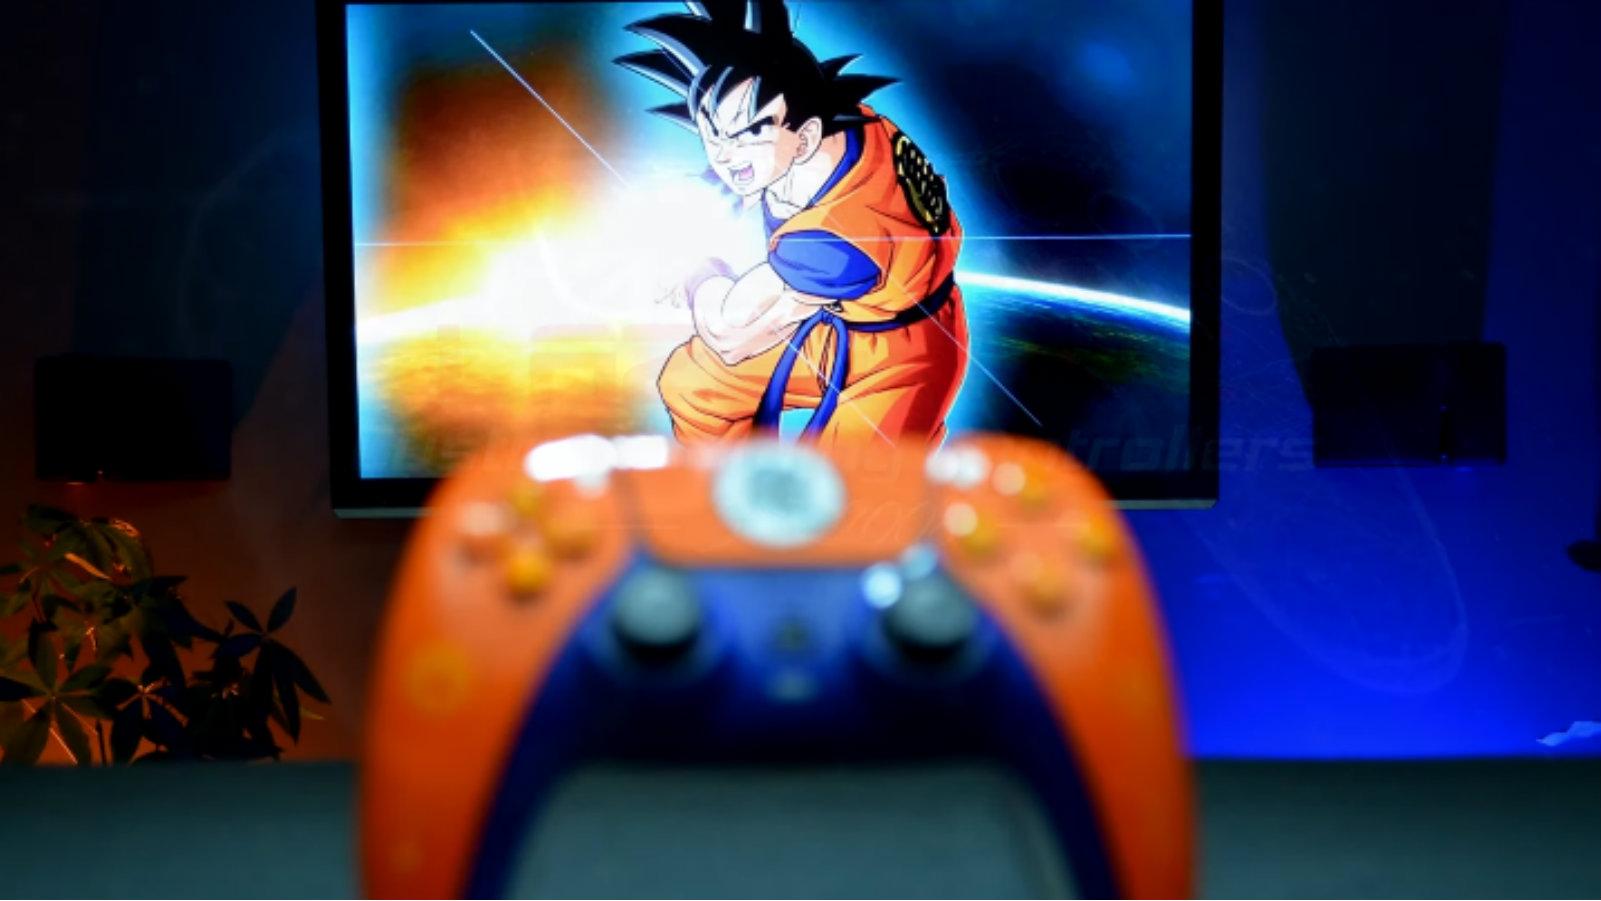 First-ever custom Dragon Ball Z controller